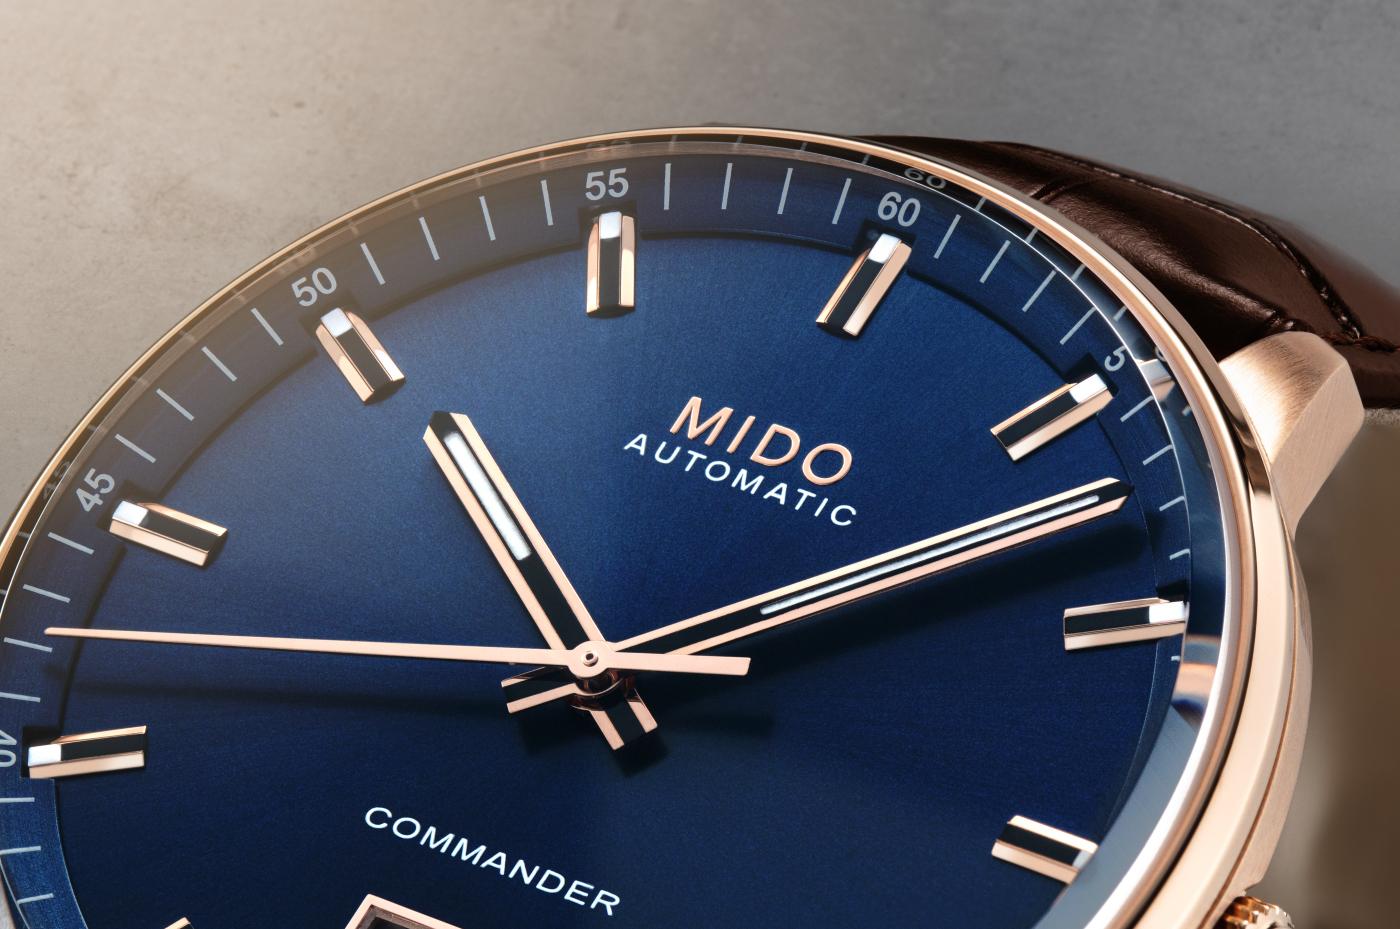 mido_commander_big_date_dial-_europa_star_watch_magazine_2021